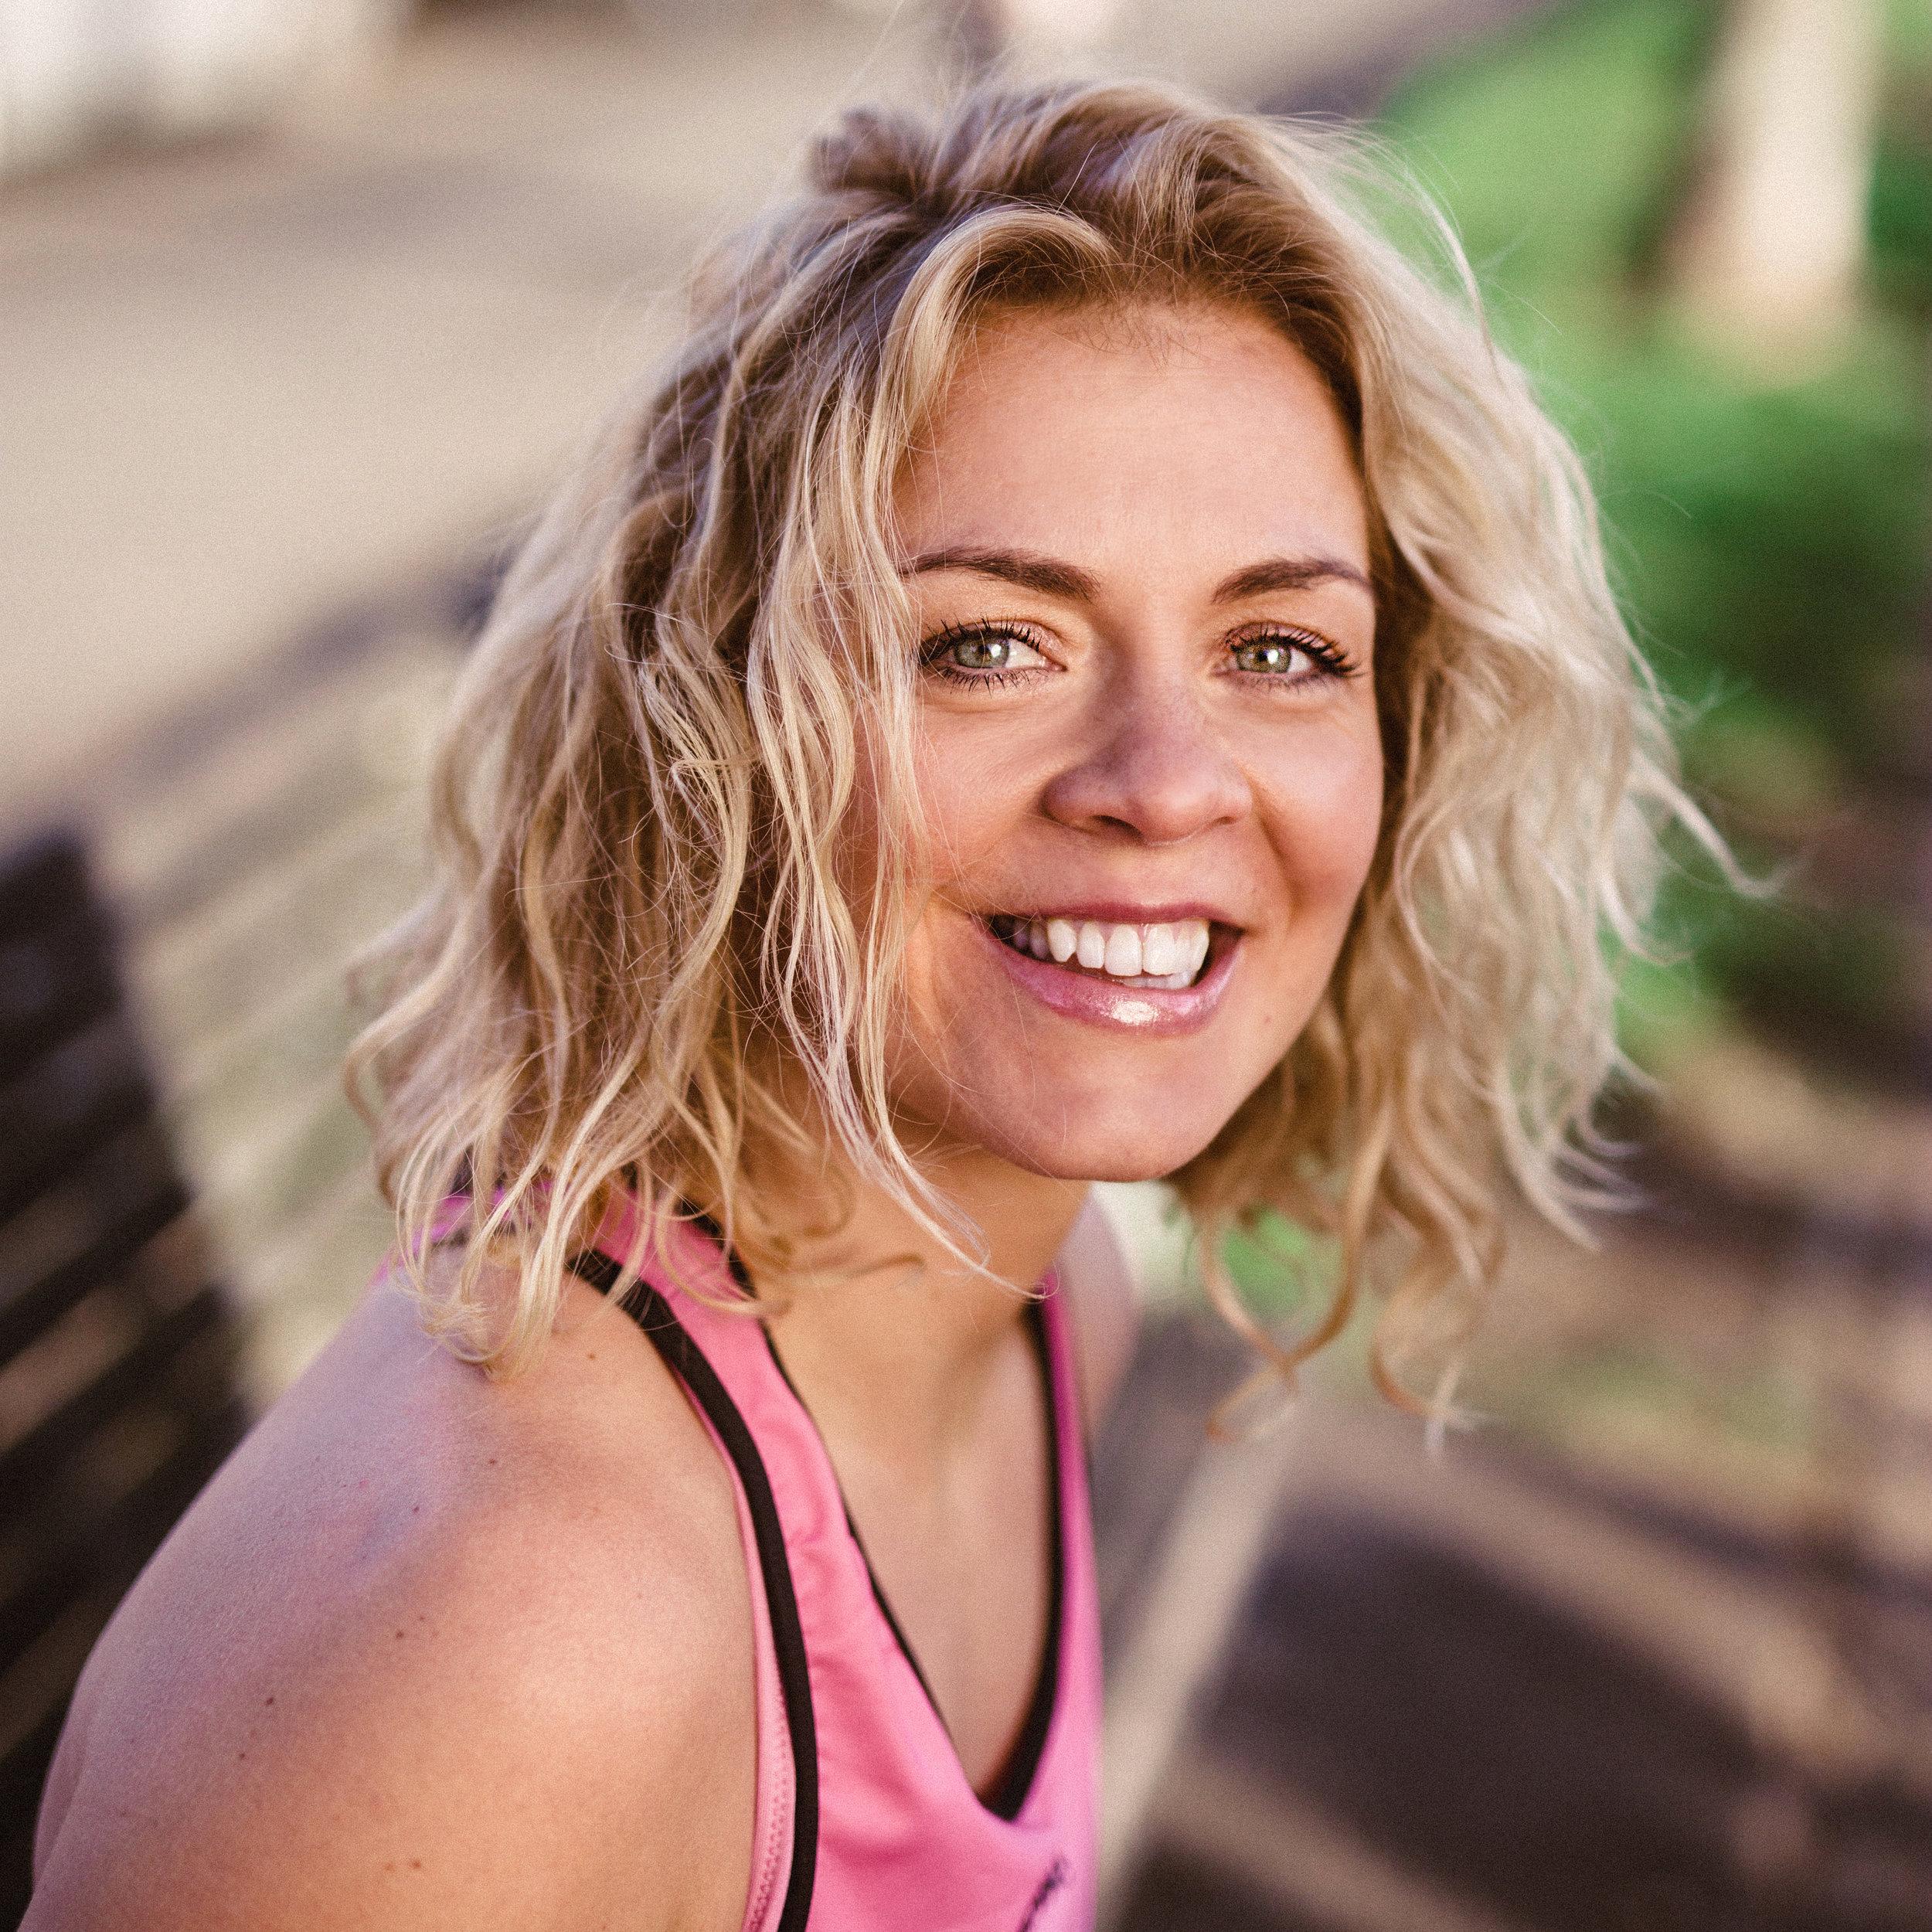 LIZ COSTIGAN , Positive.Fitness.Project Morning Yoga/Meditation  @positive.fitness.project  >  BIO